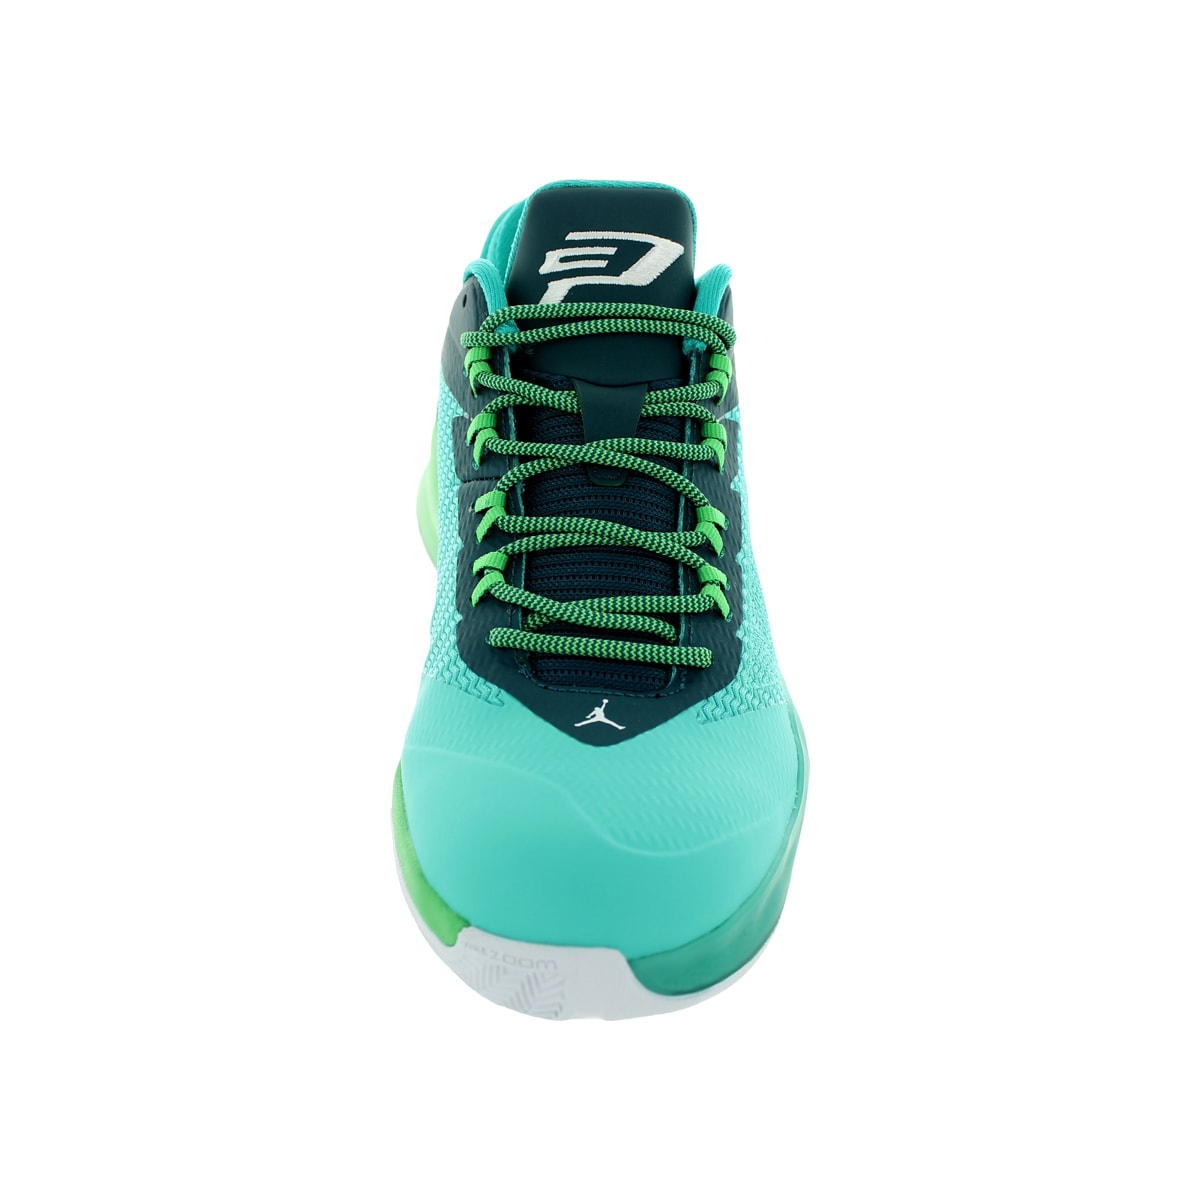 9ff34348e2e9c6 Shop Nike Jordan Men s Jordan Cp3.Viii Retro White Teal Black Basketball  Shoe - Free Shipping Today - Overstock - 12318562